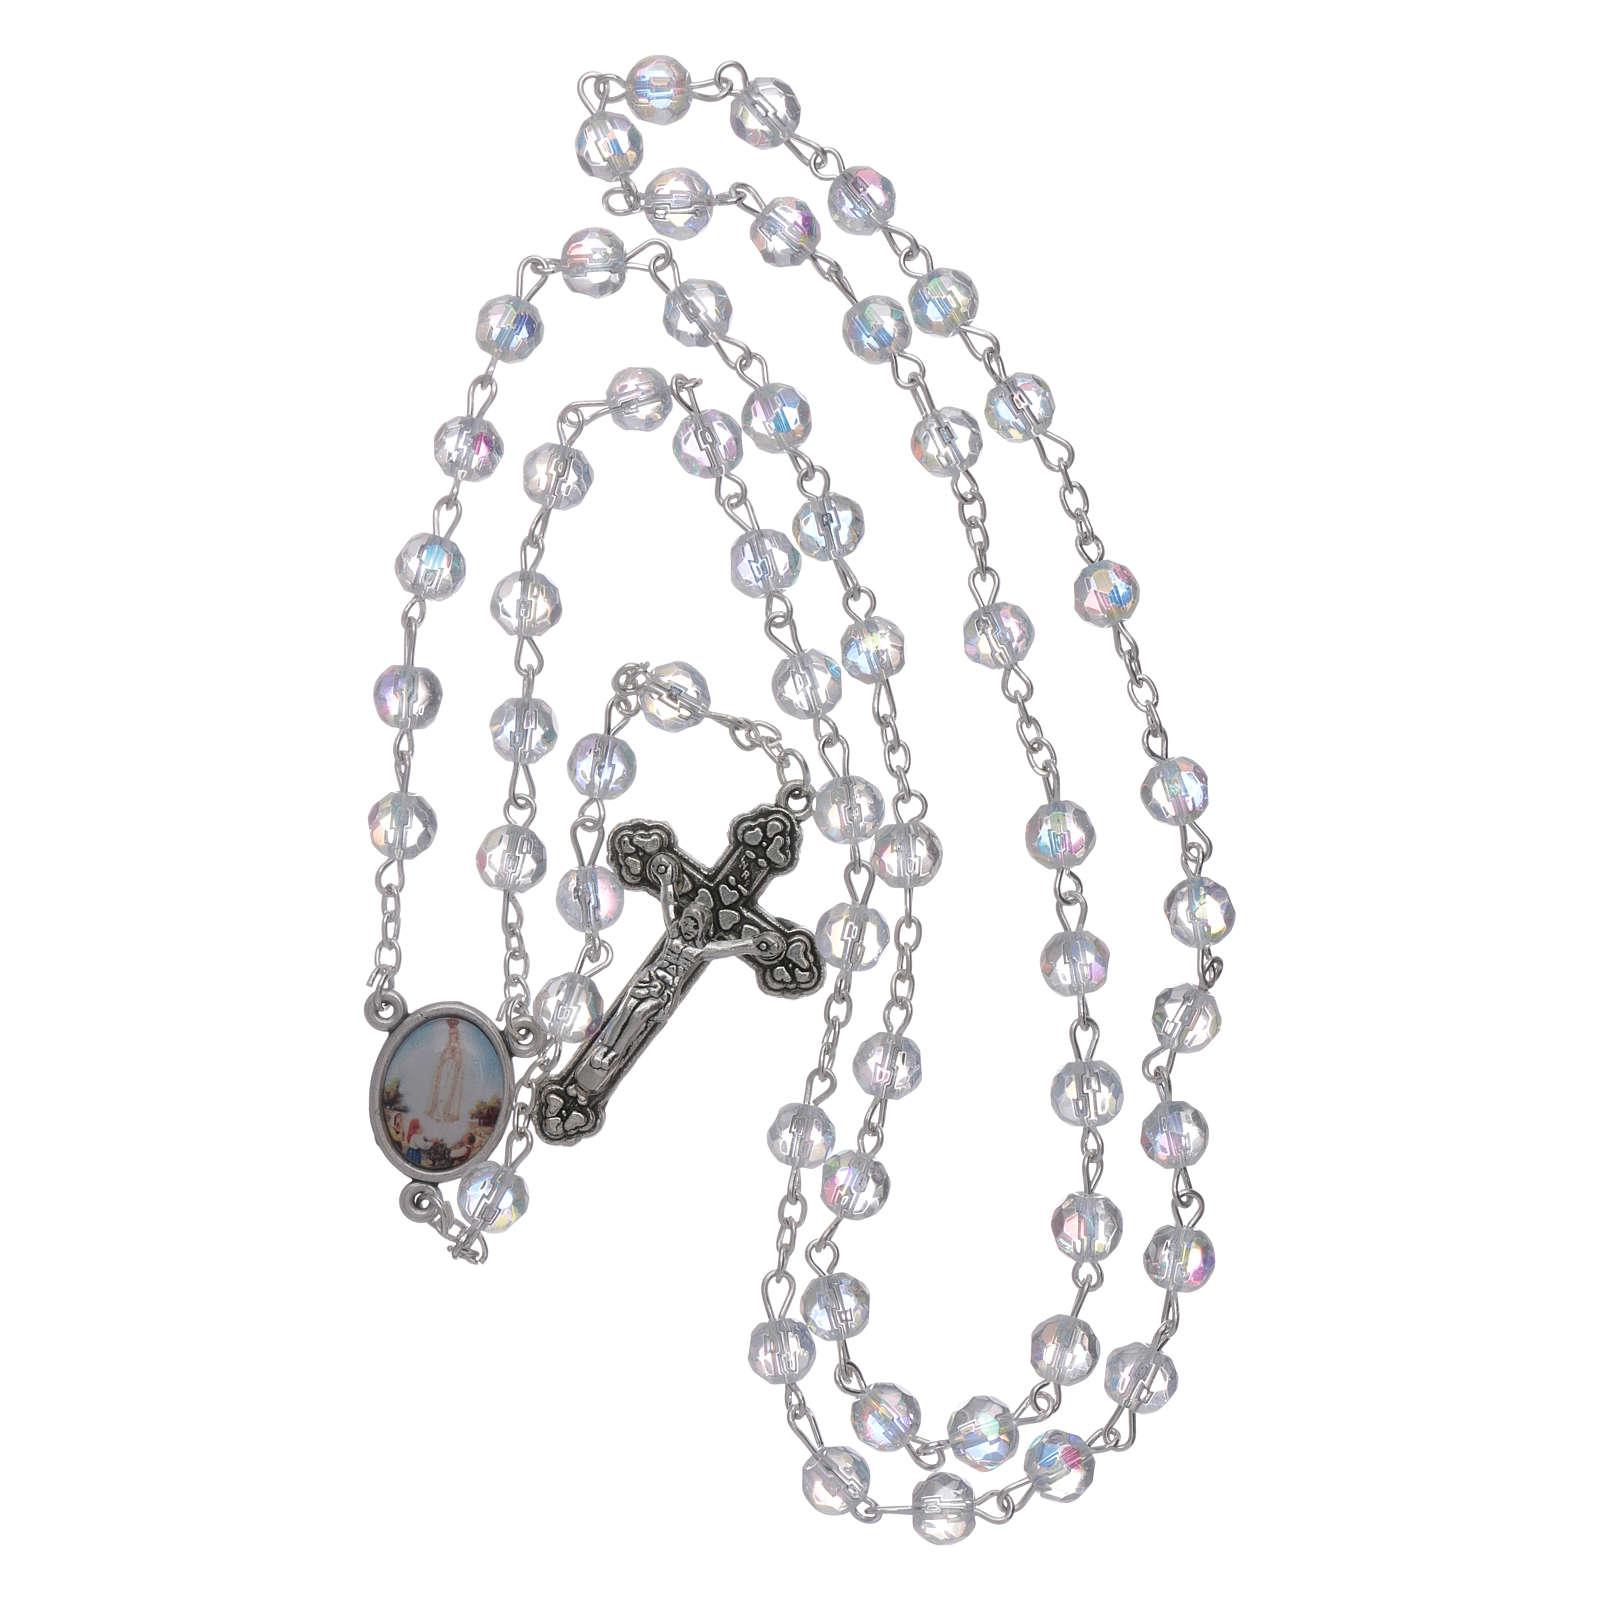 Chapelet Fatima grains cristal transparent 6 mm 4